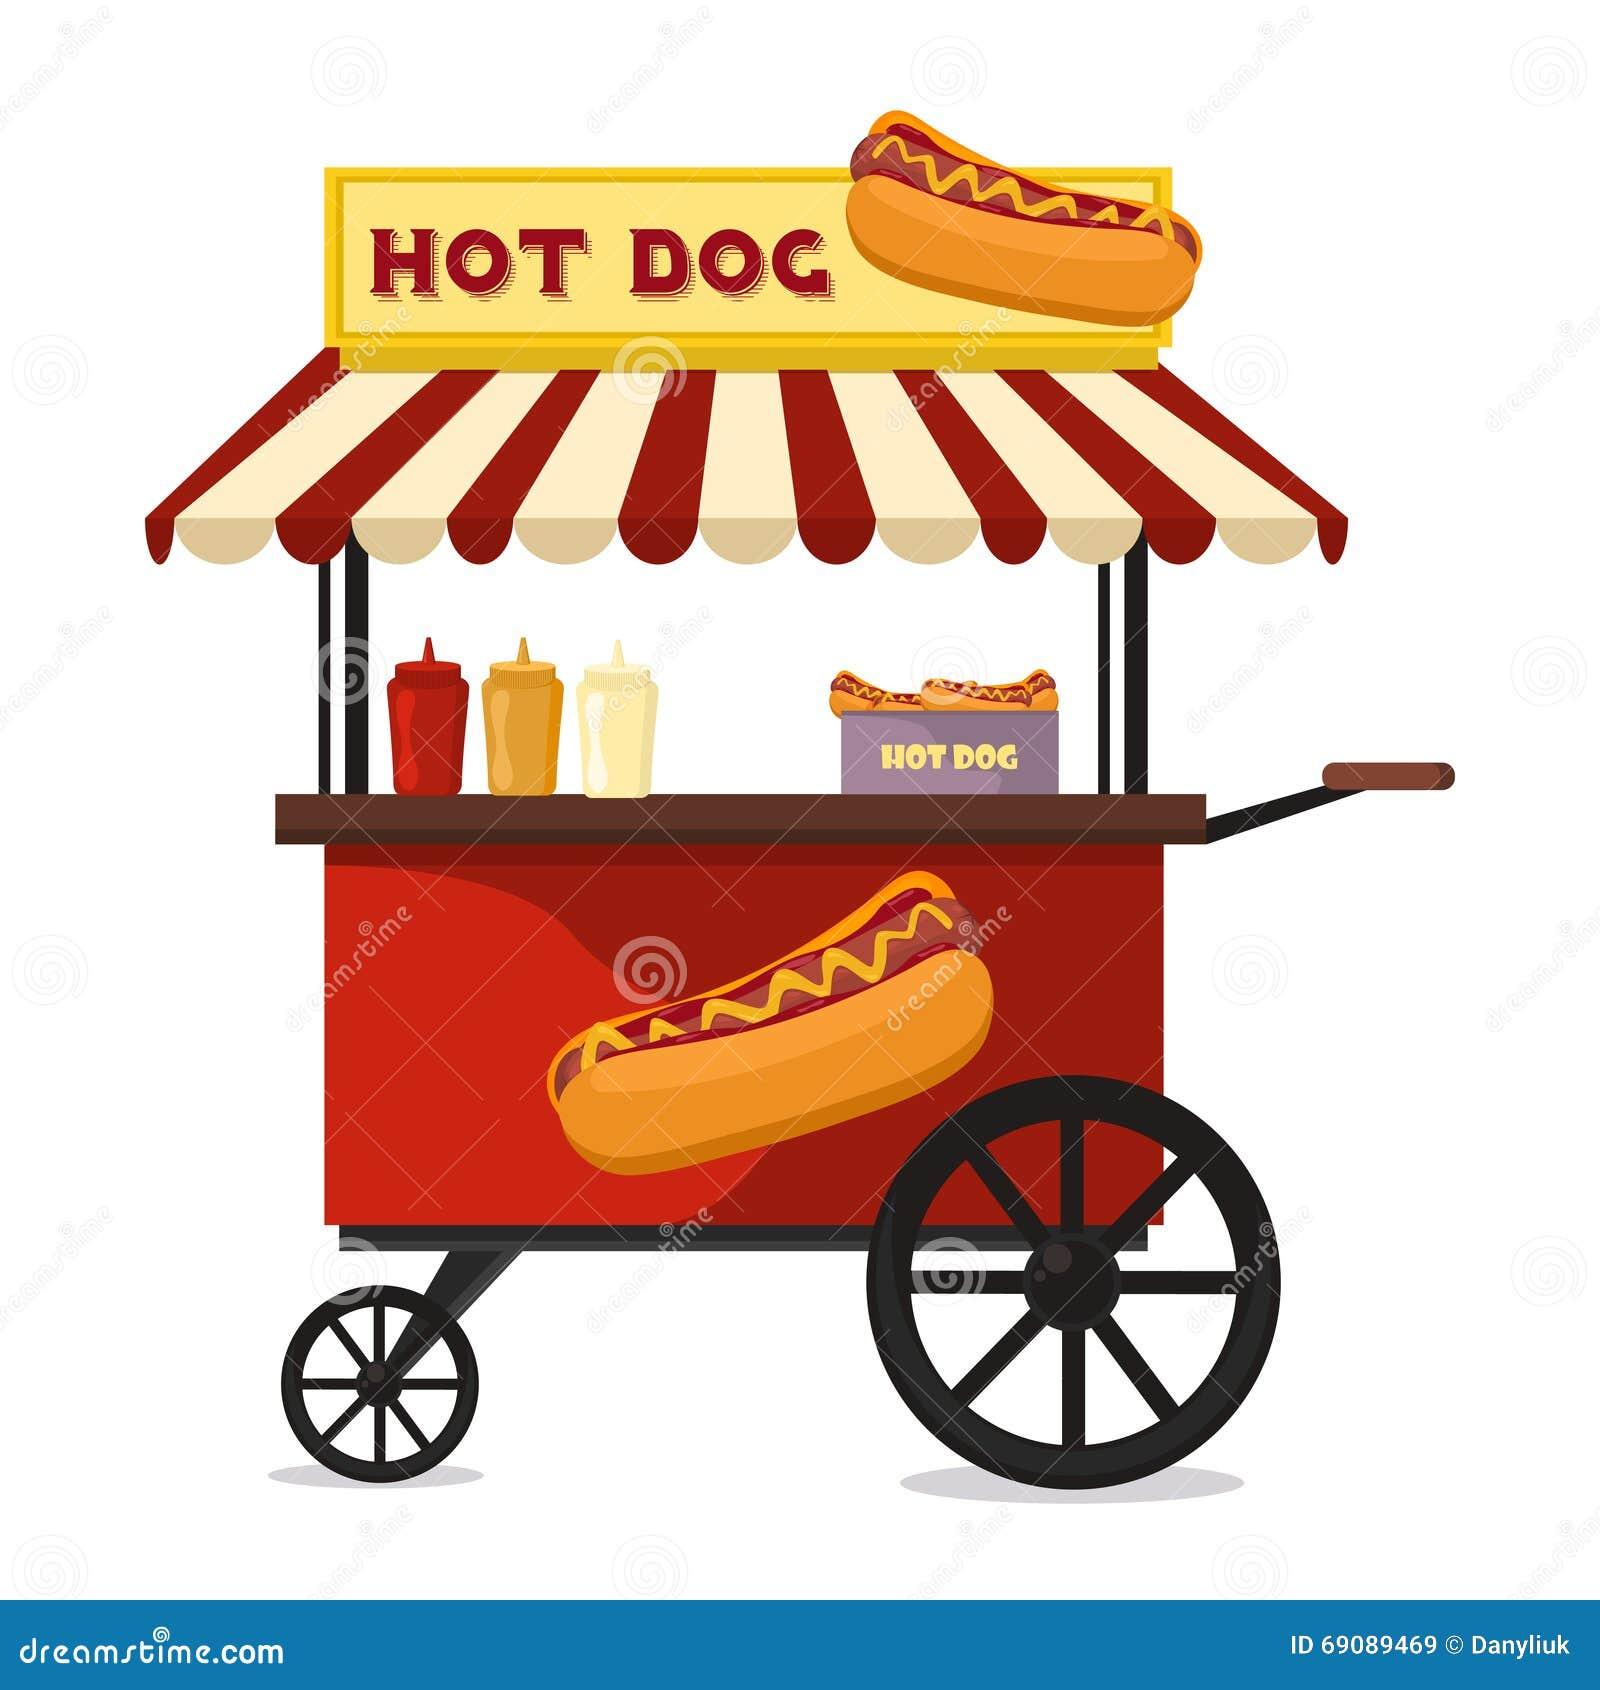 Hot Dog Fast Food Shop Street Cart City Flat Vector Stock